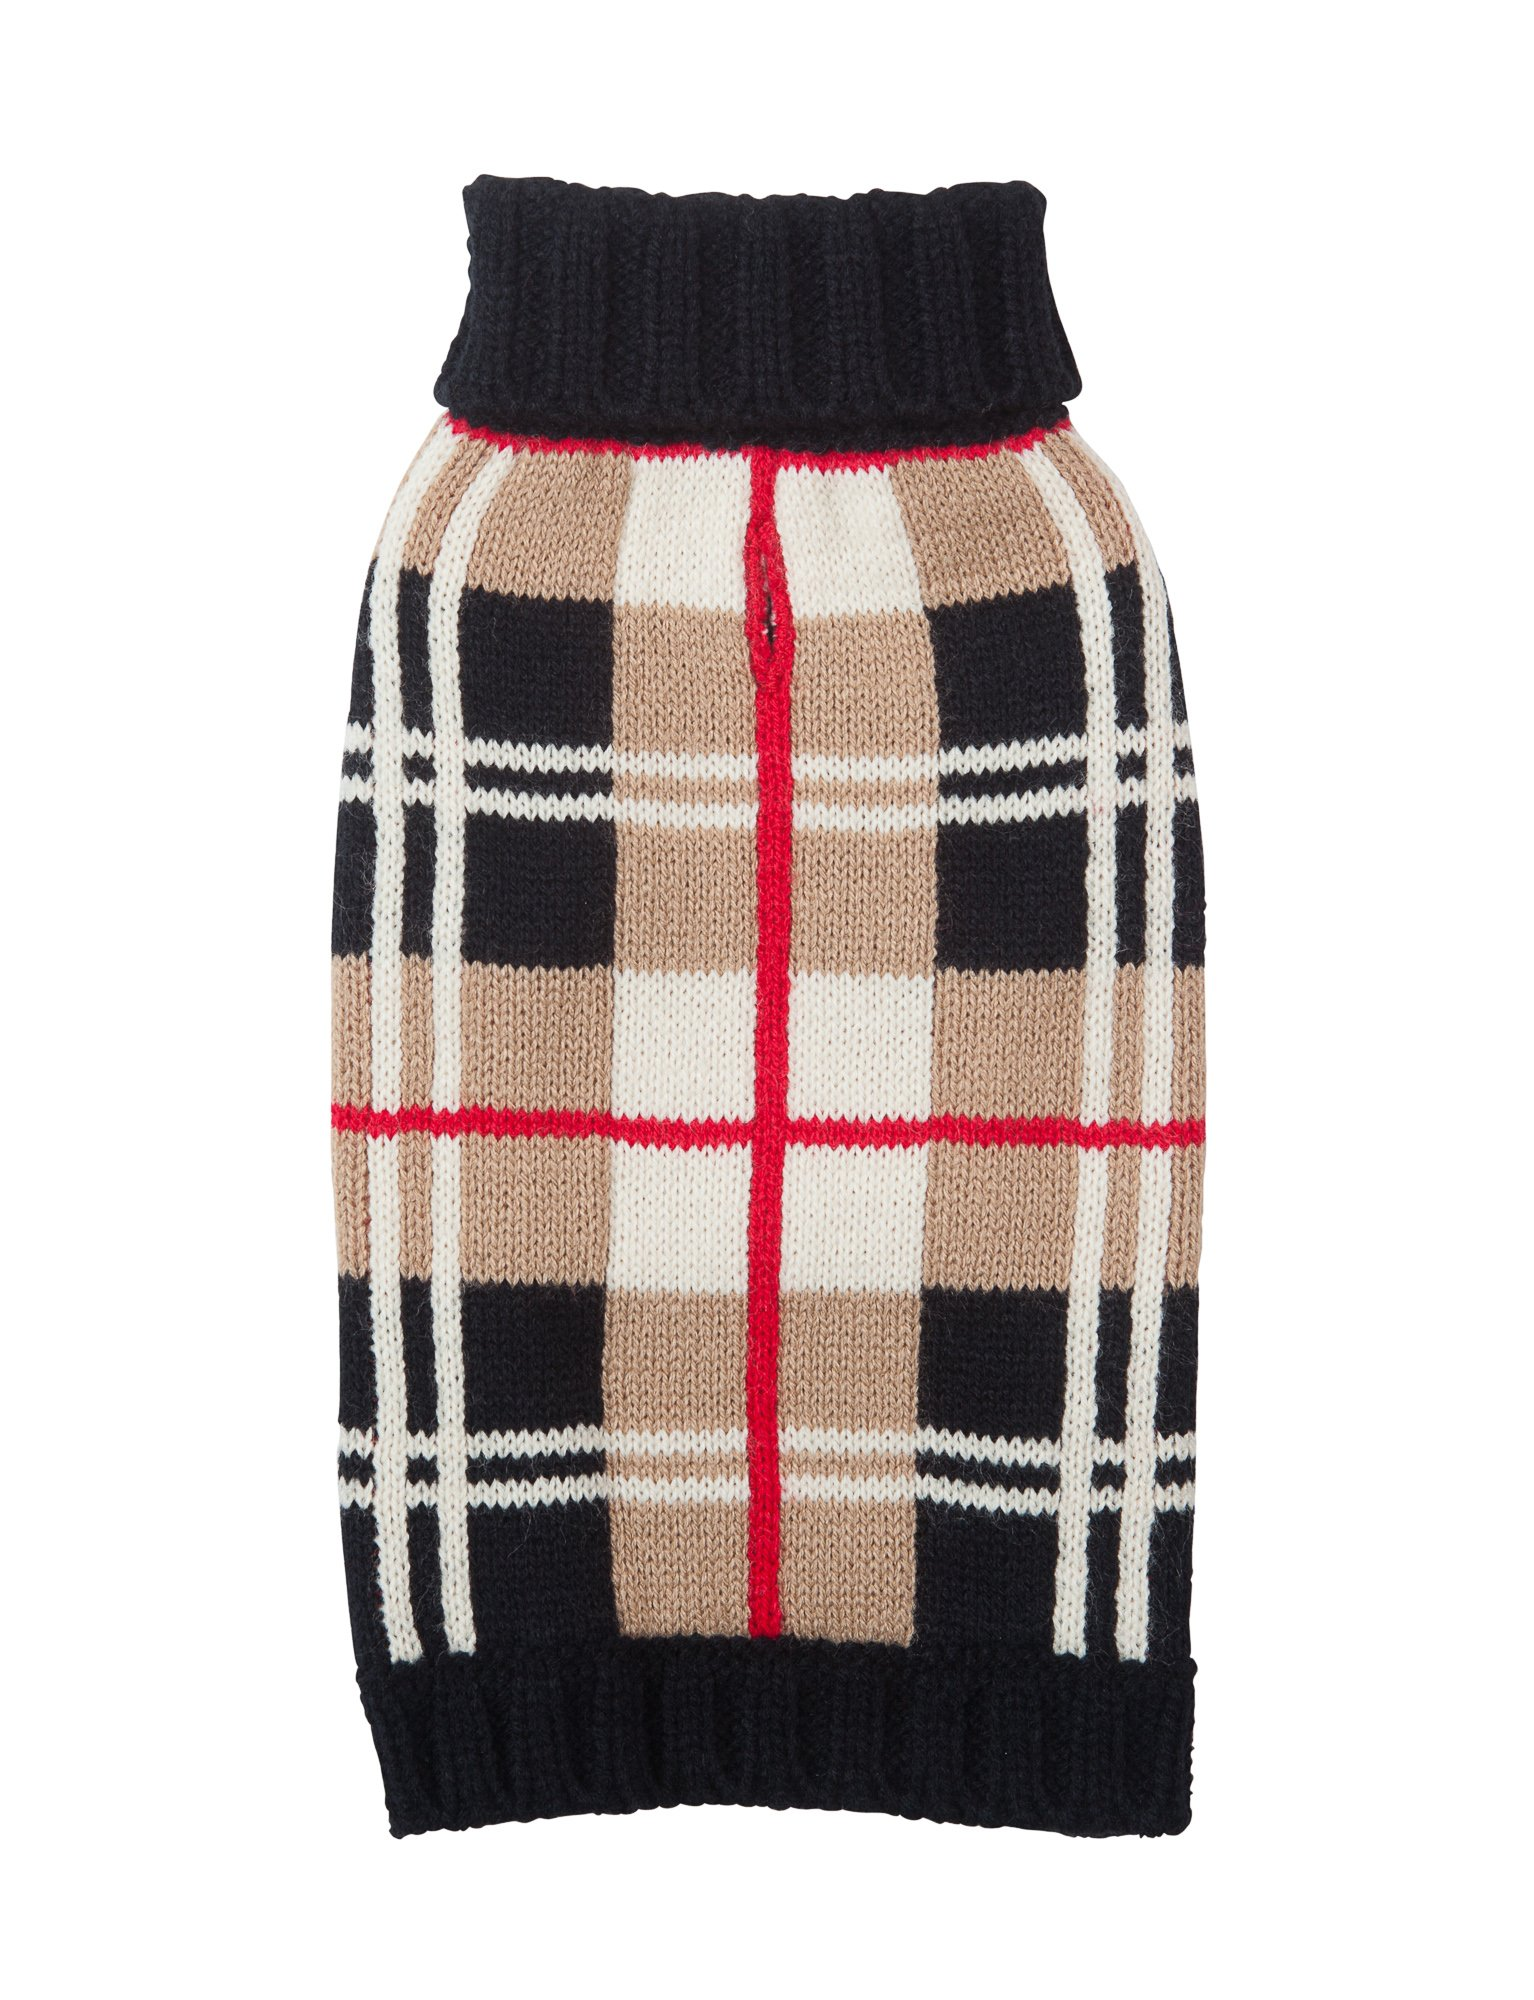 fabdog Plaid Dog Sweater (24'')